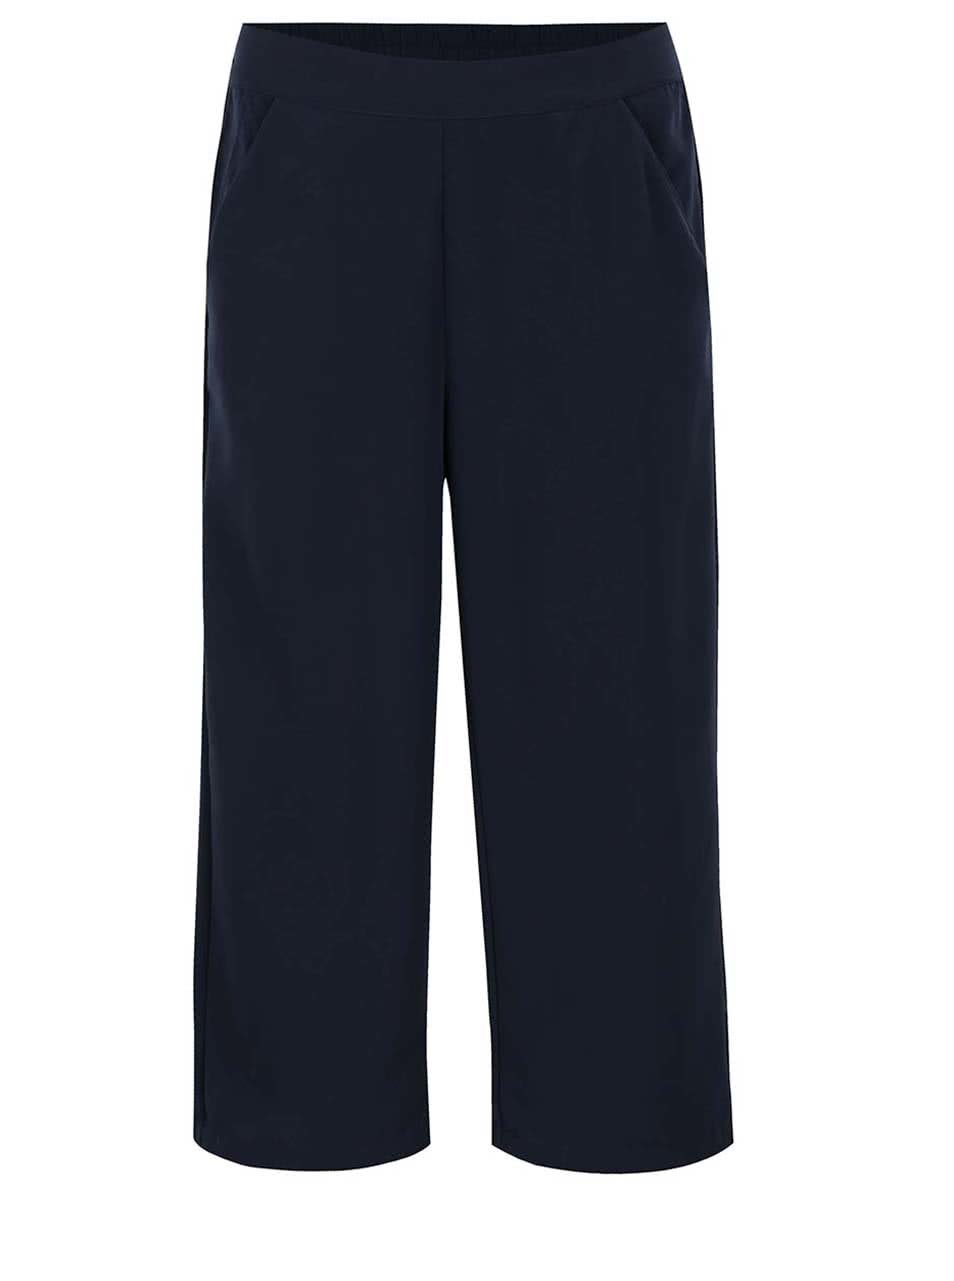 Tmavě modré culottes kalhoty VERO MODA Maggie